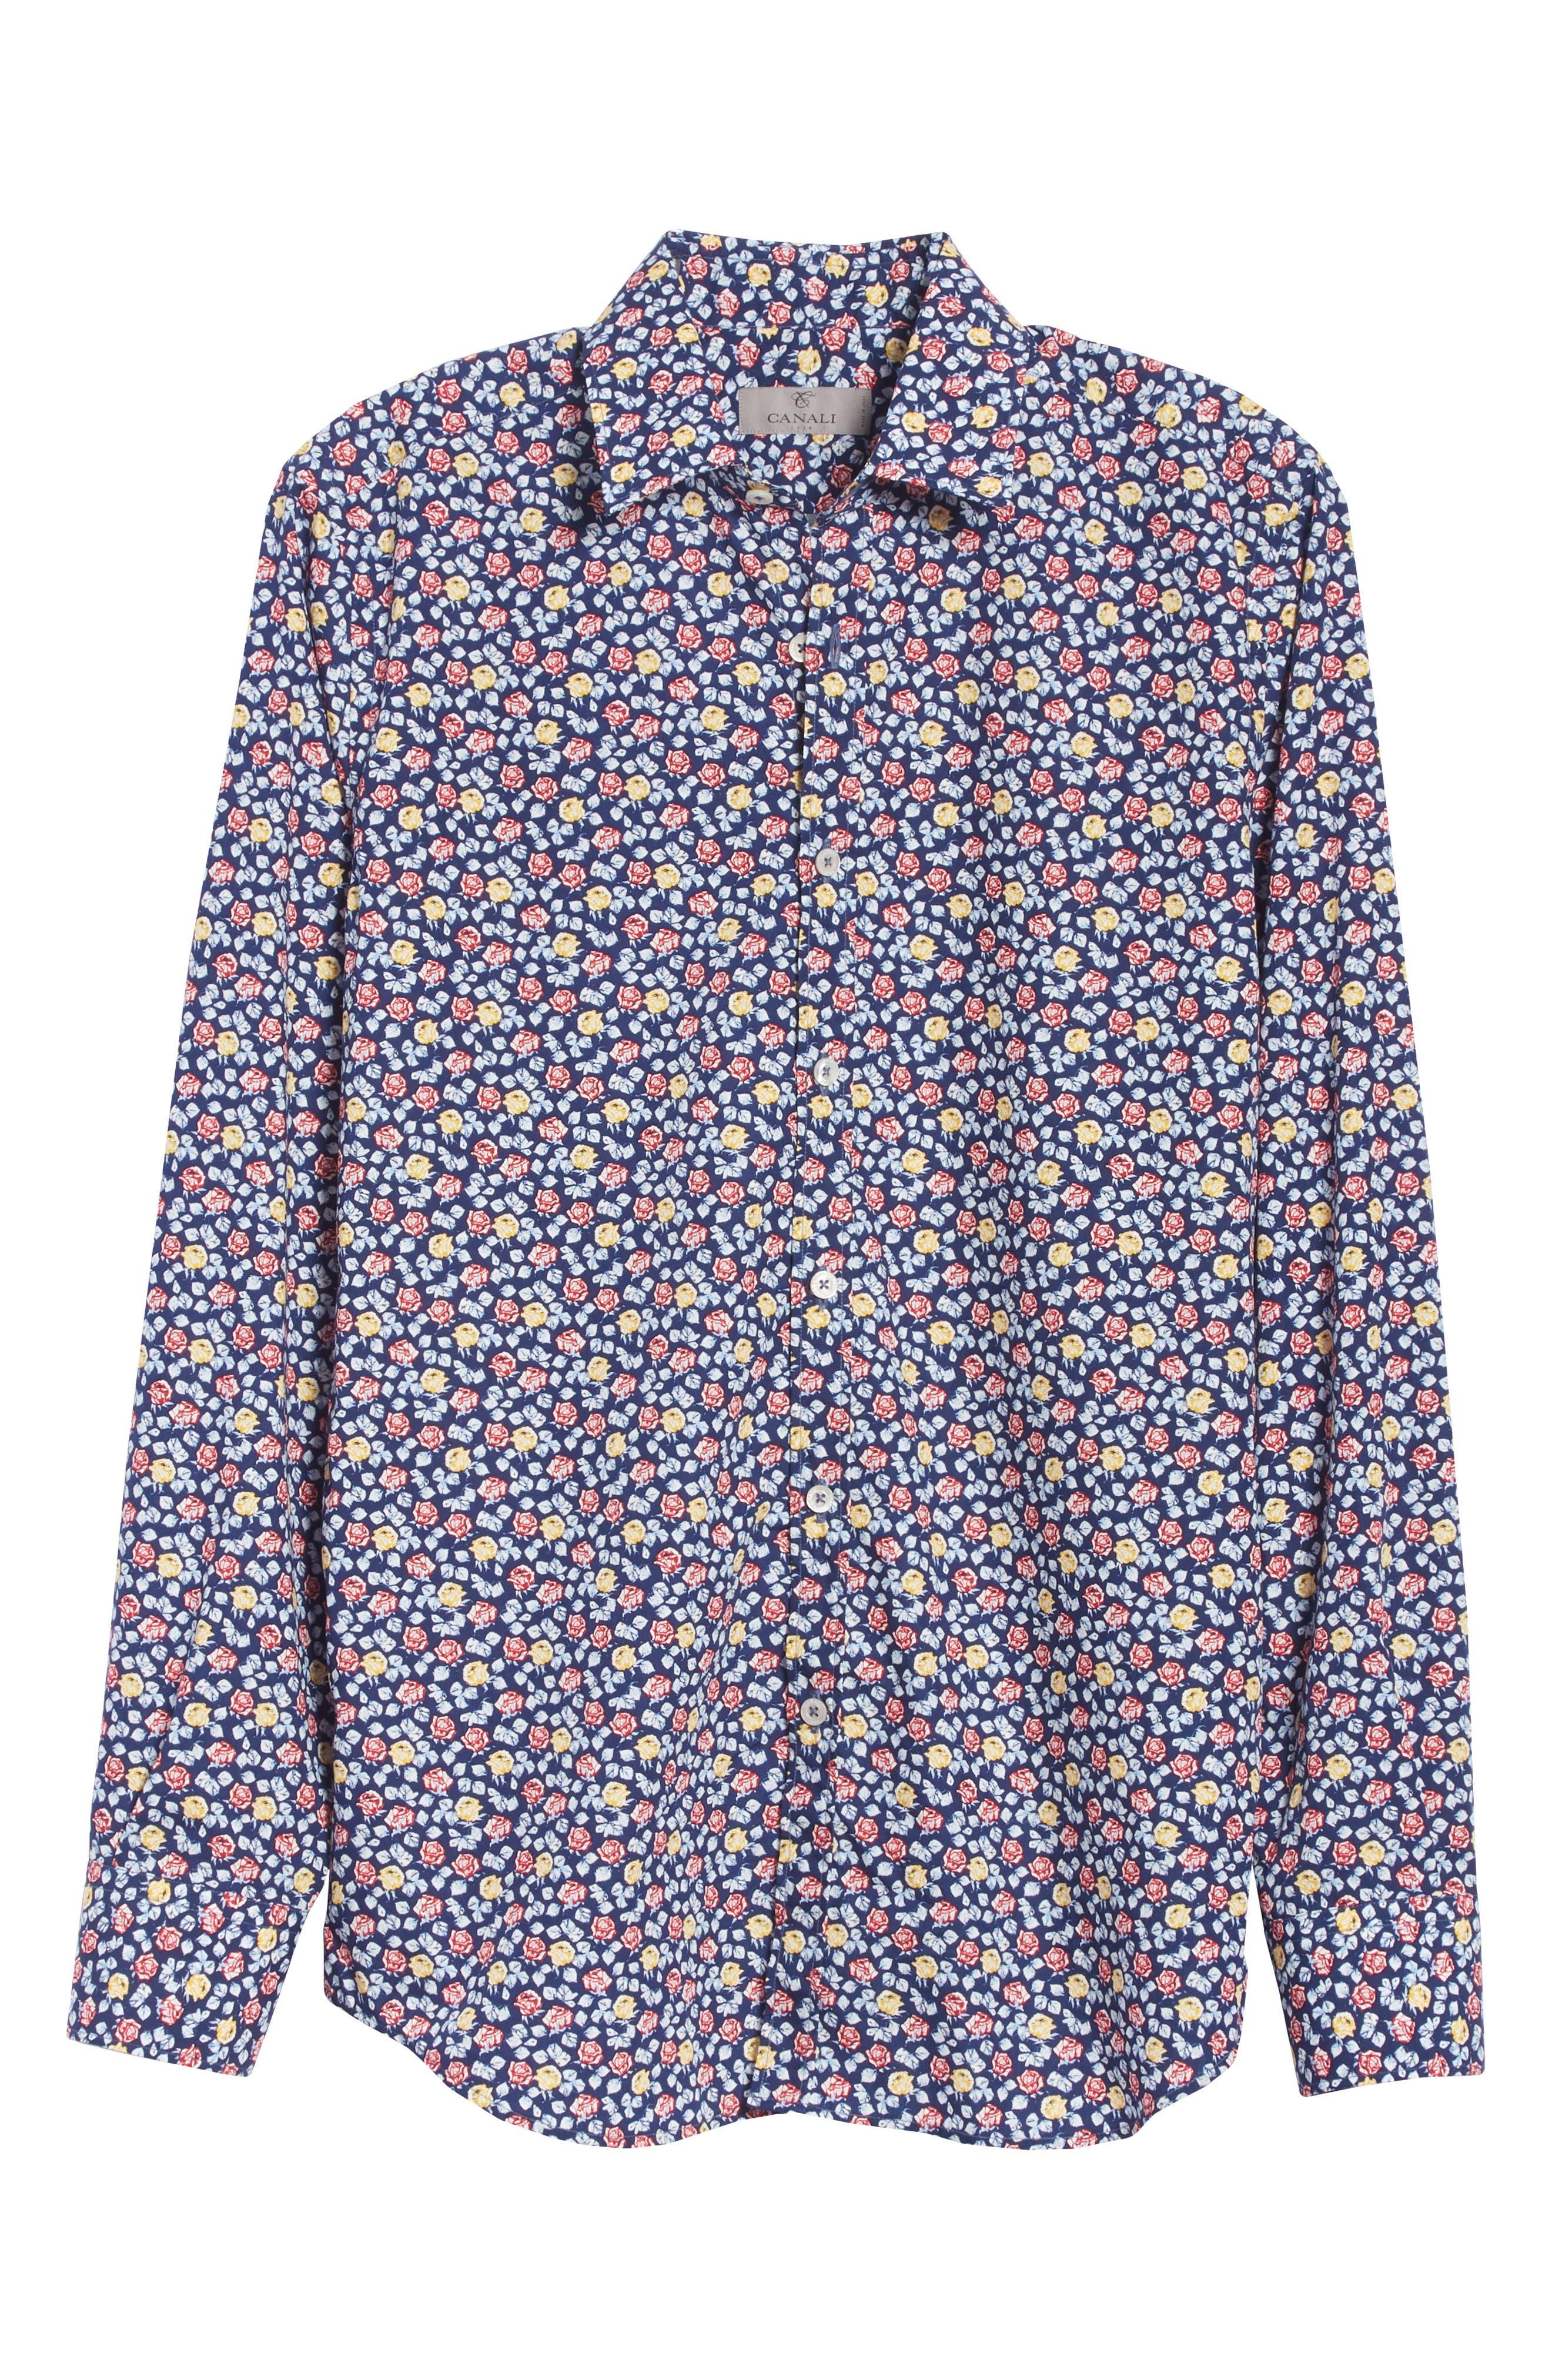 Regular Fit Floral Sport Shirt,                             Alternate thumbnail 6, color,                             400